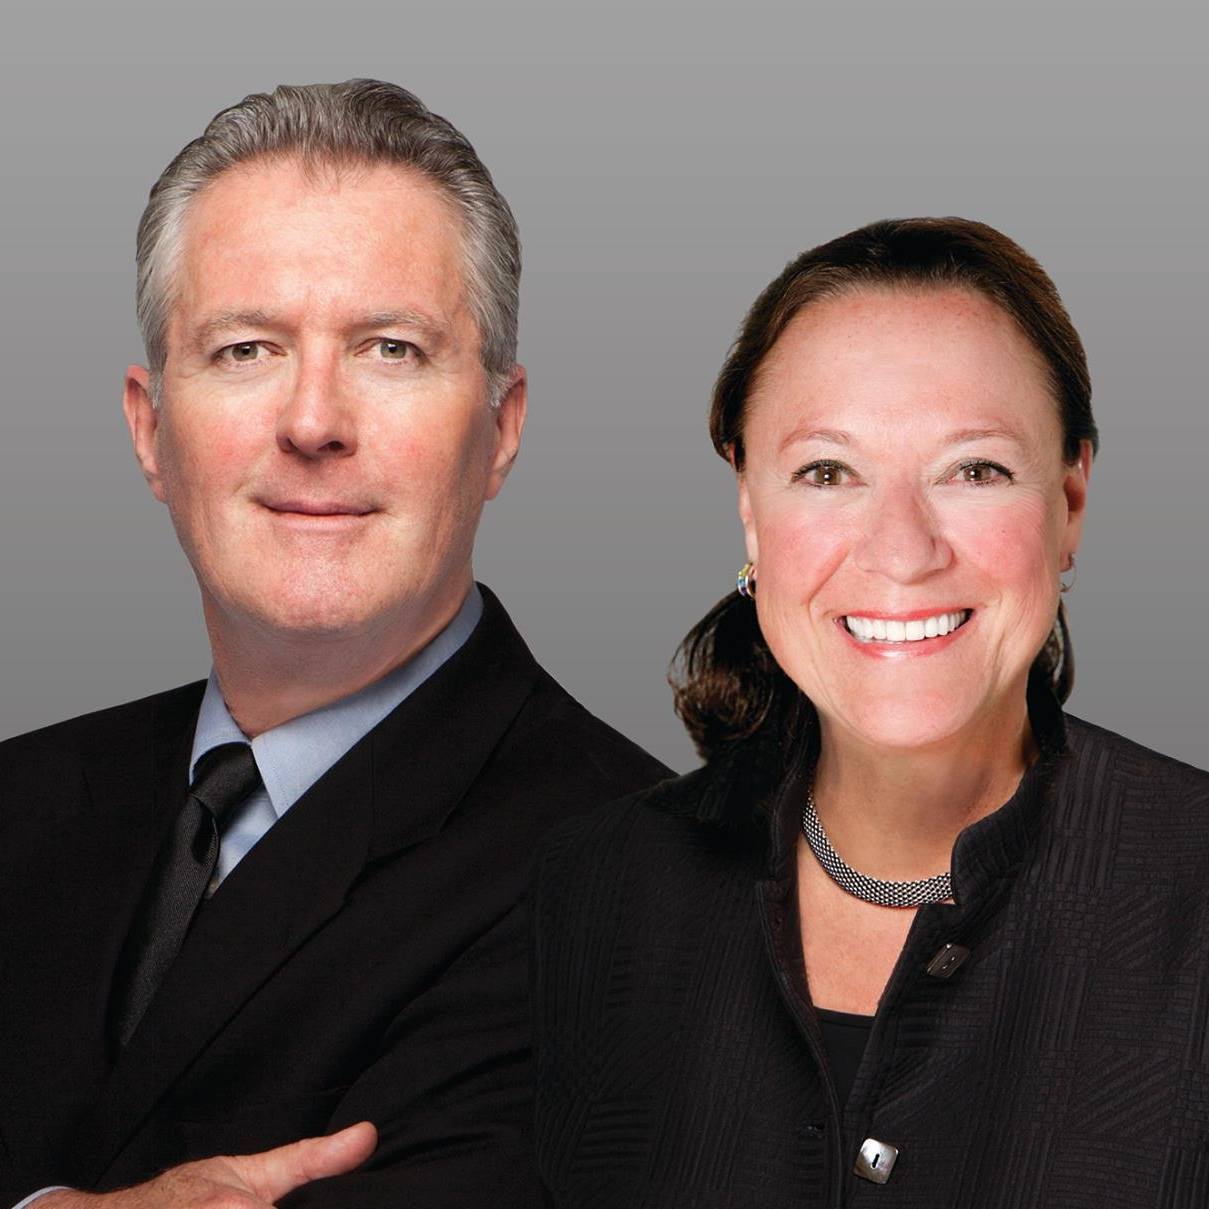 David and Holly Hawes